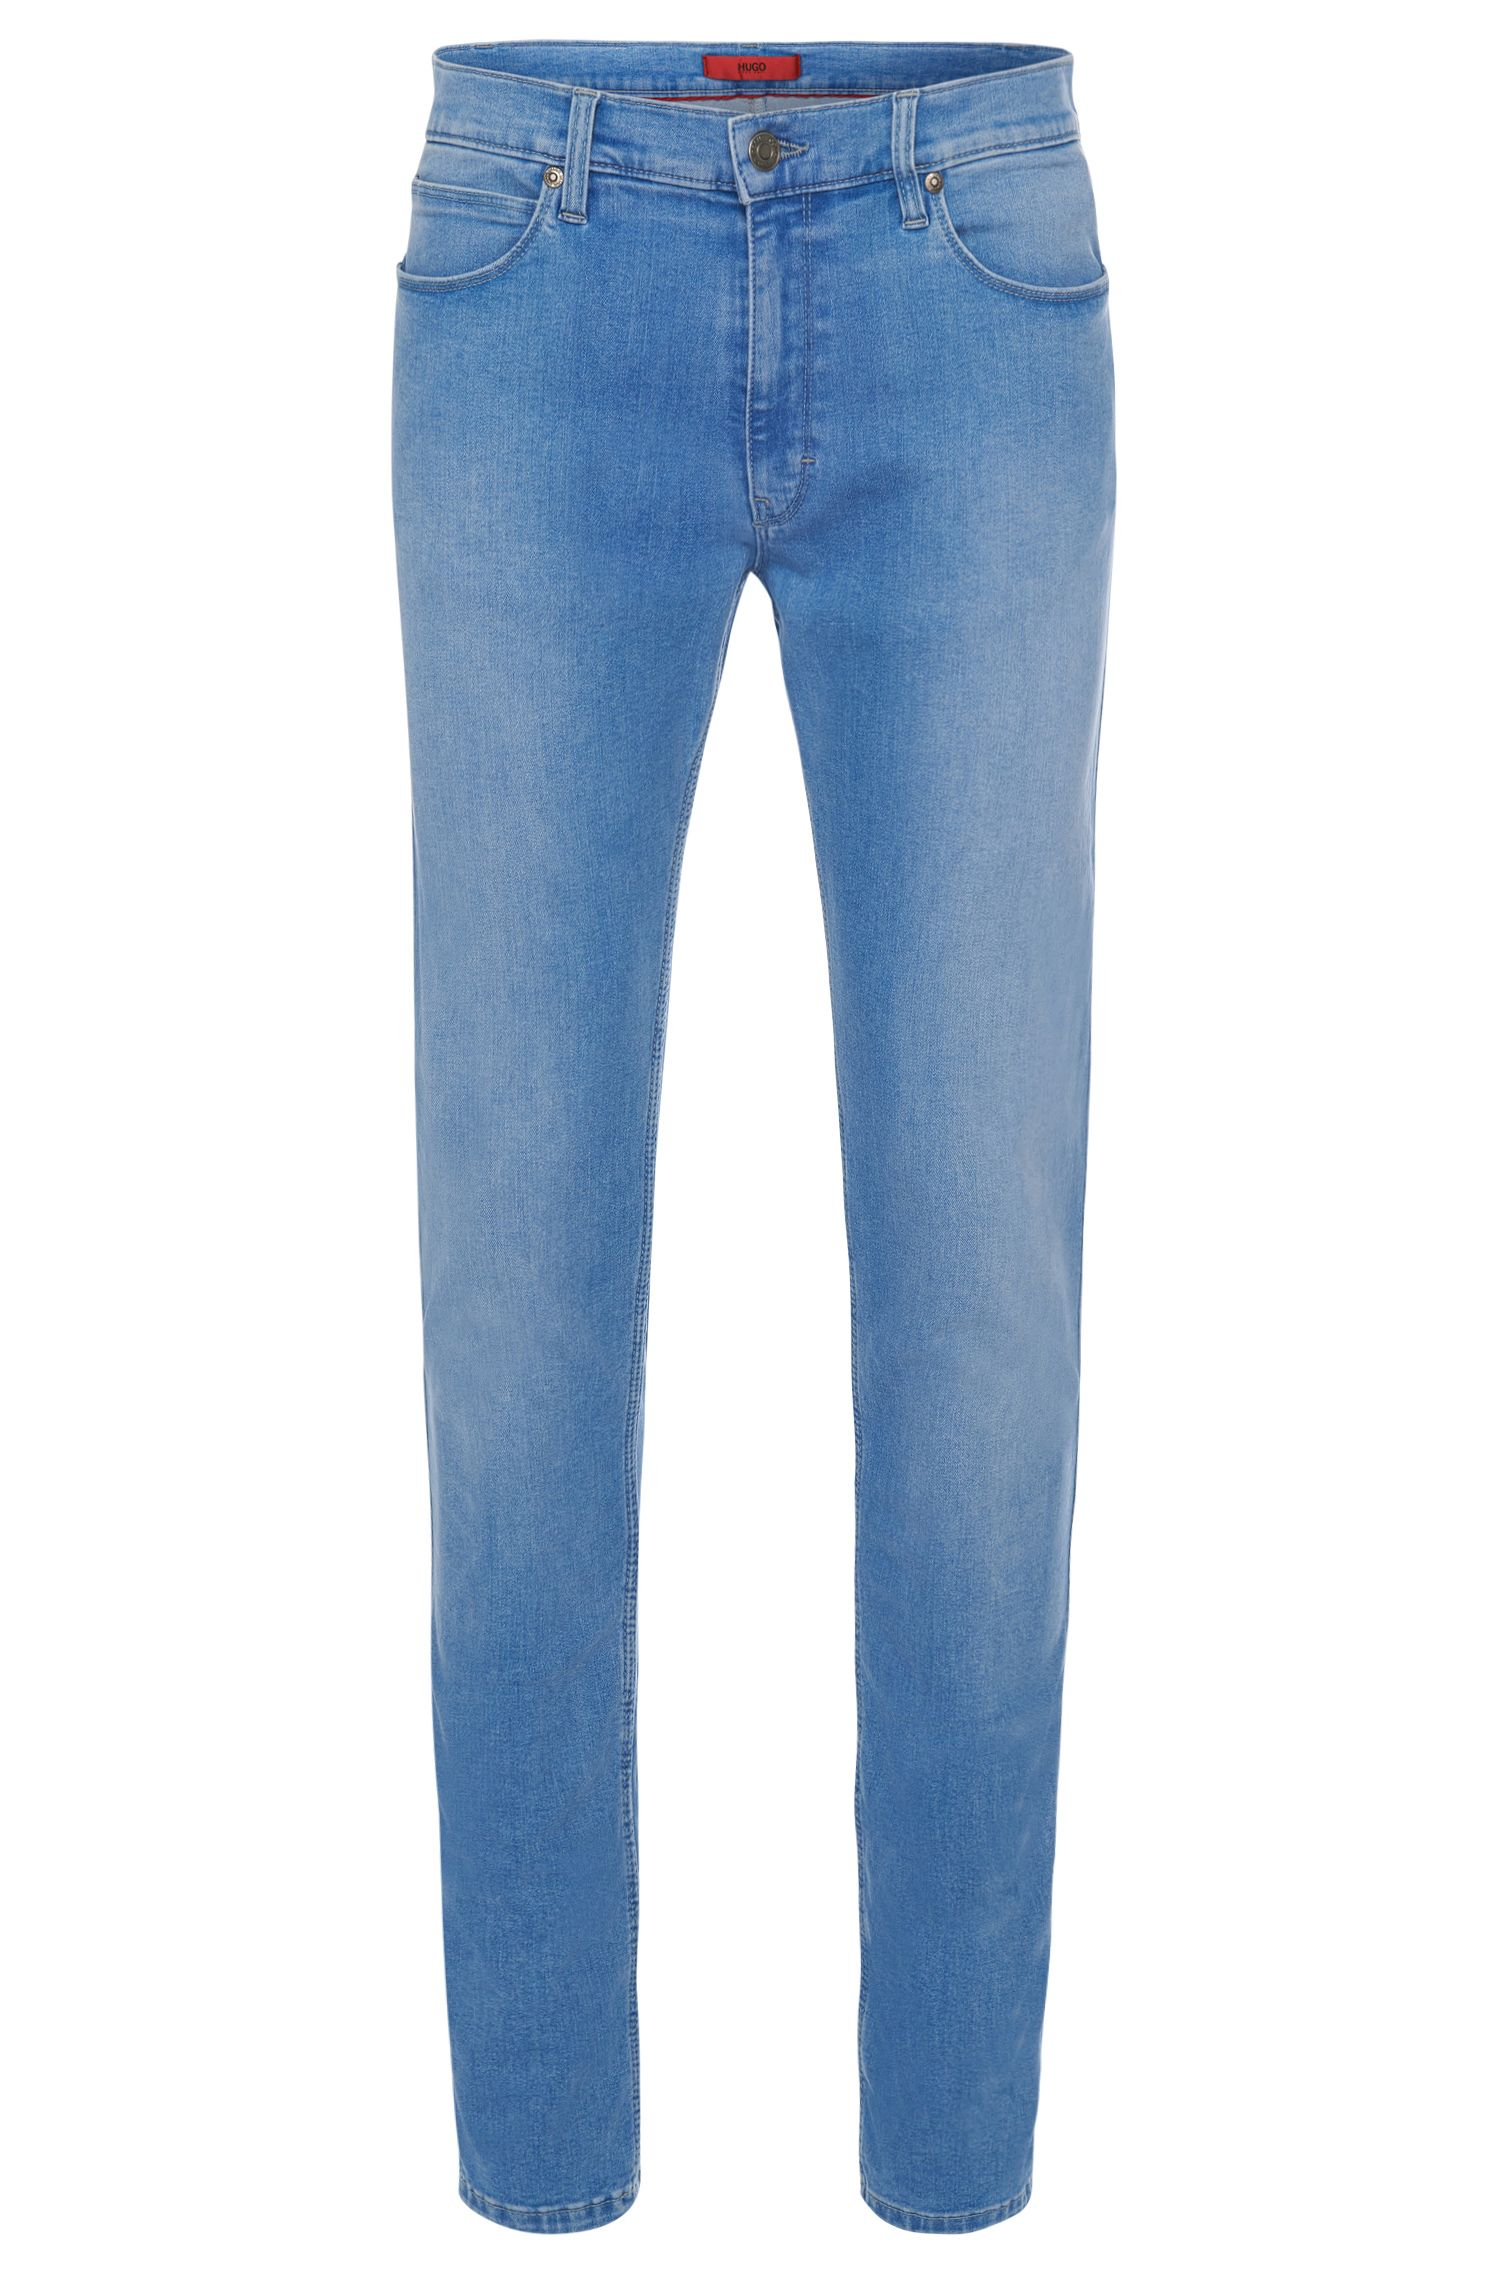 11.75 oz Stretch Cotton Blend Jeans, Slim Fit | Hugo 734